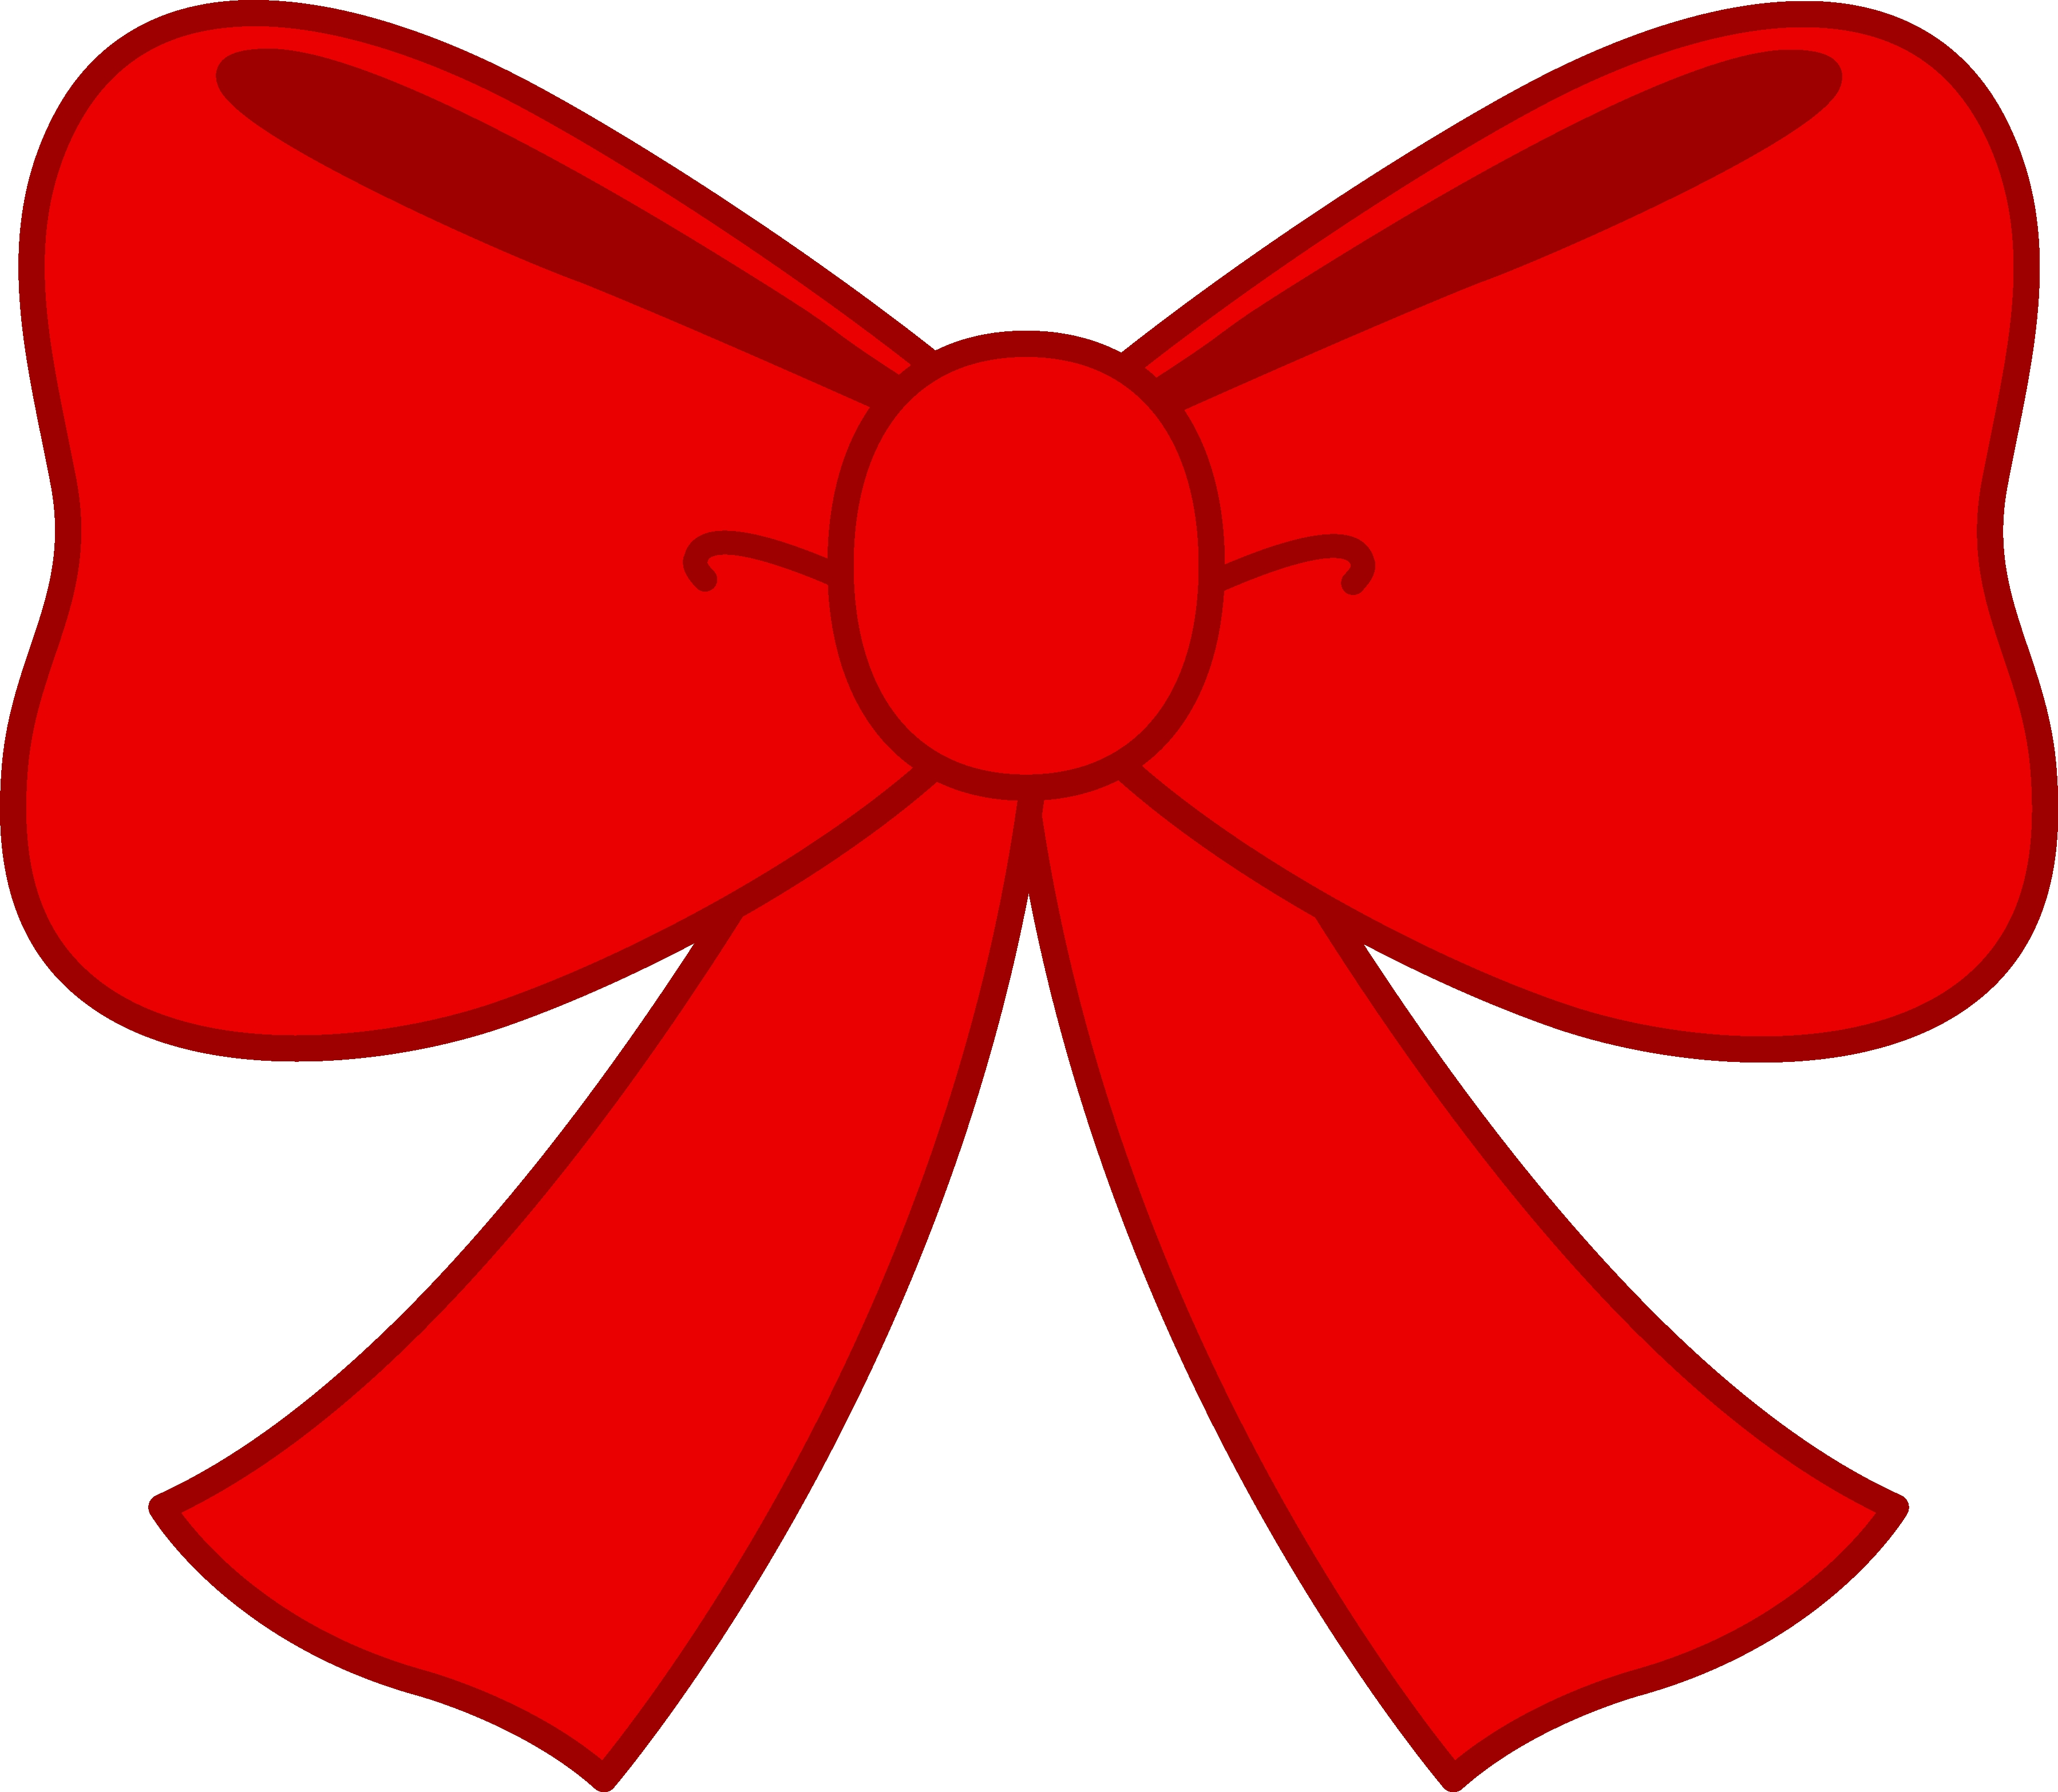 1 clipart ribbon. Best of design digital